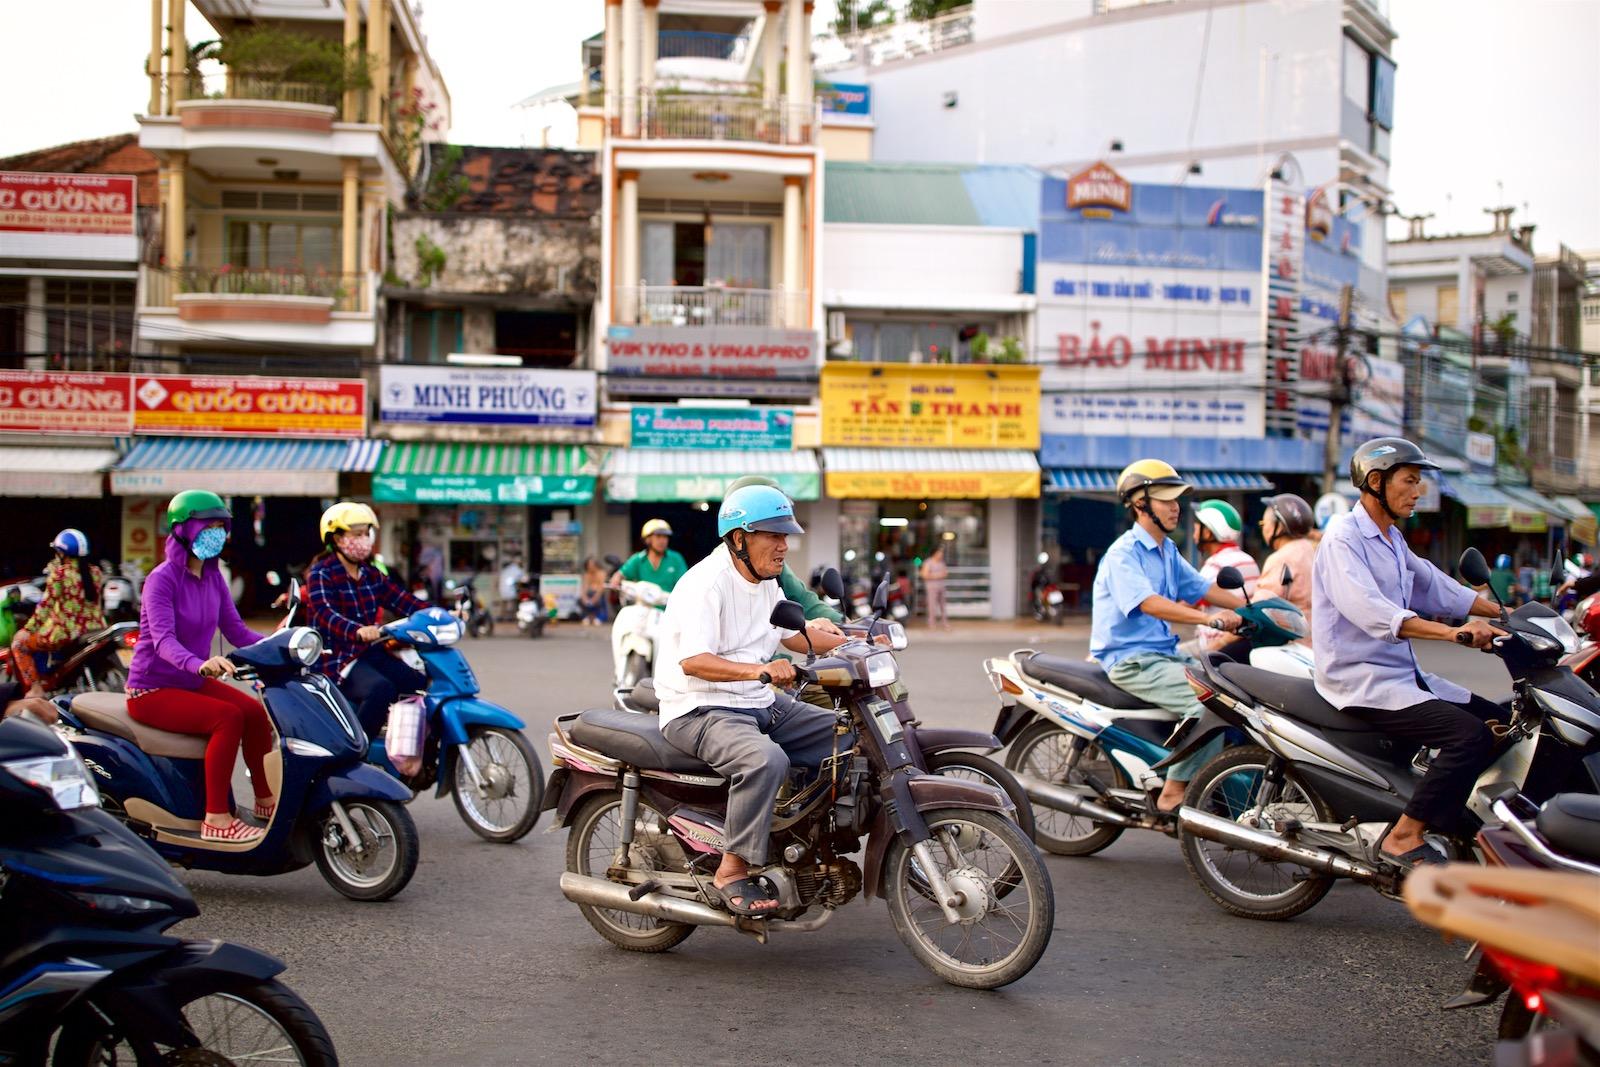 My Tho Vietnam